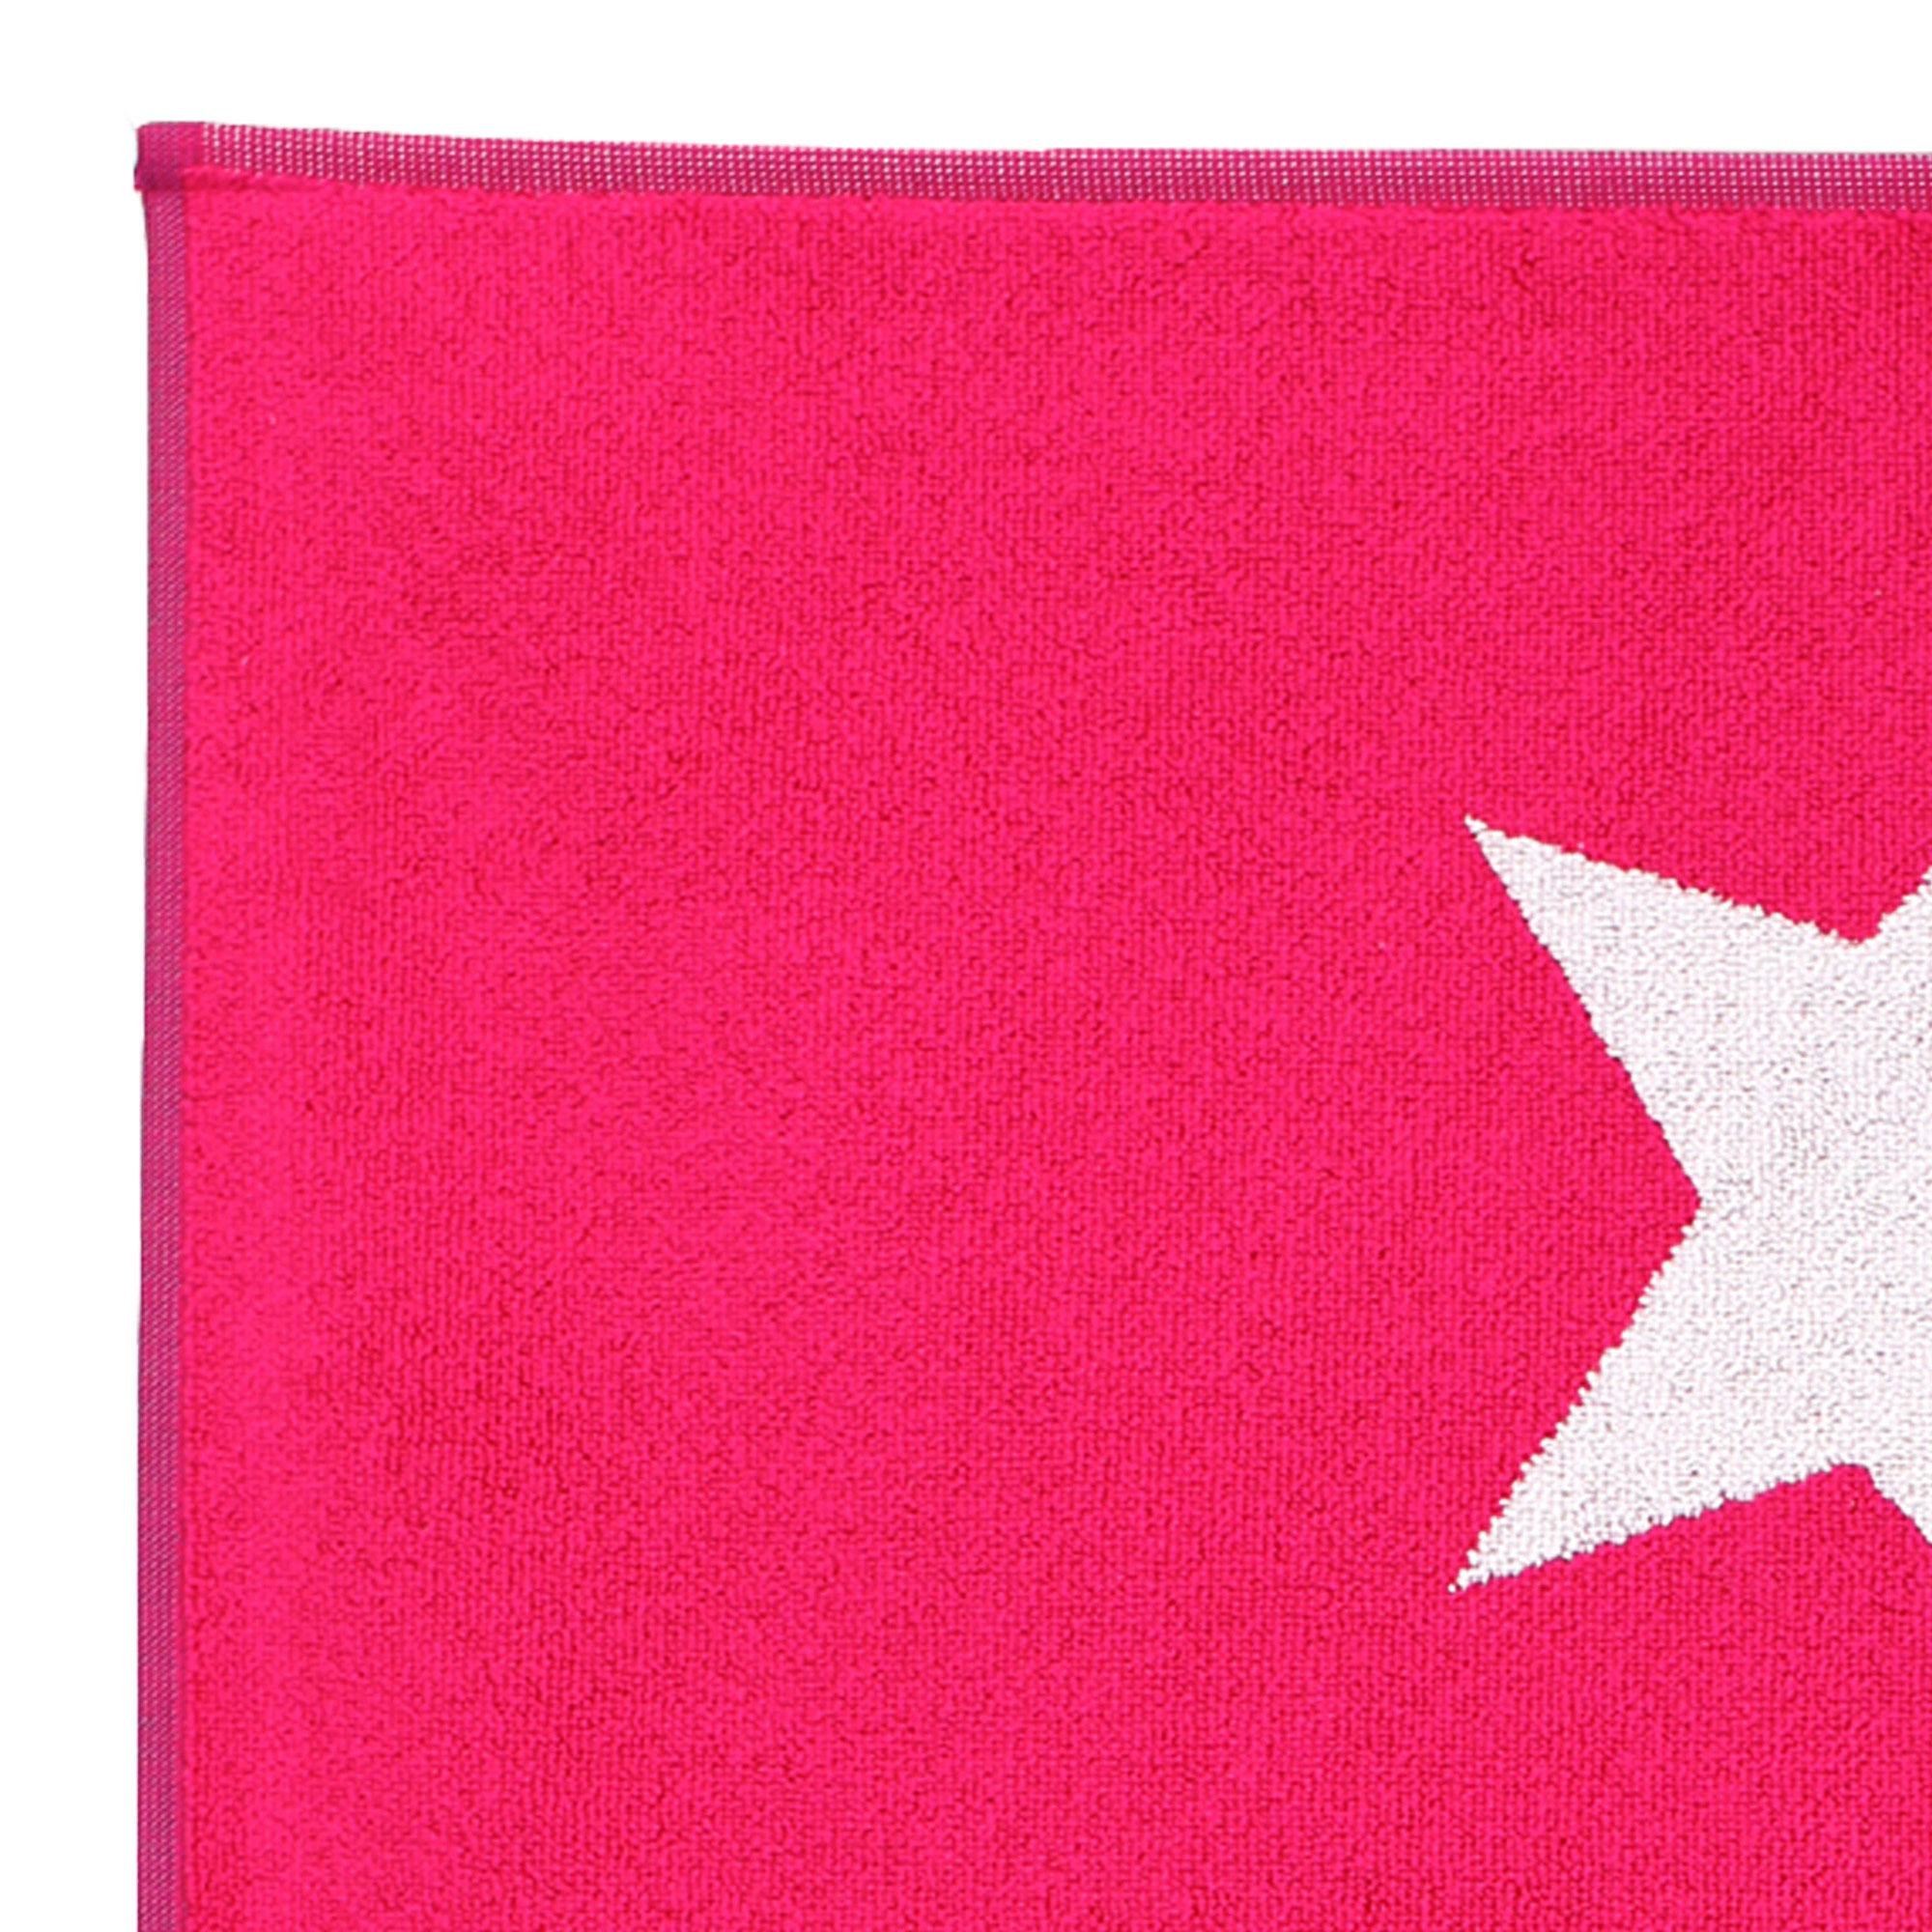 Tapis de bain 60x90 100 coton 700g m2 stars rose ebay - Tapis salle de bain rose ...